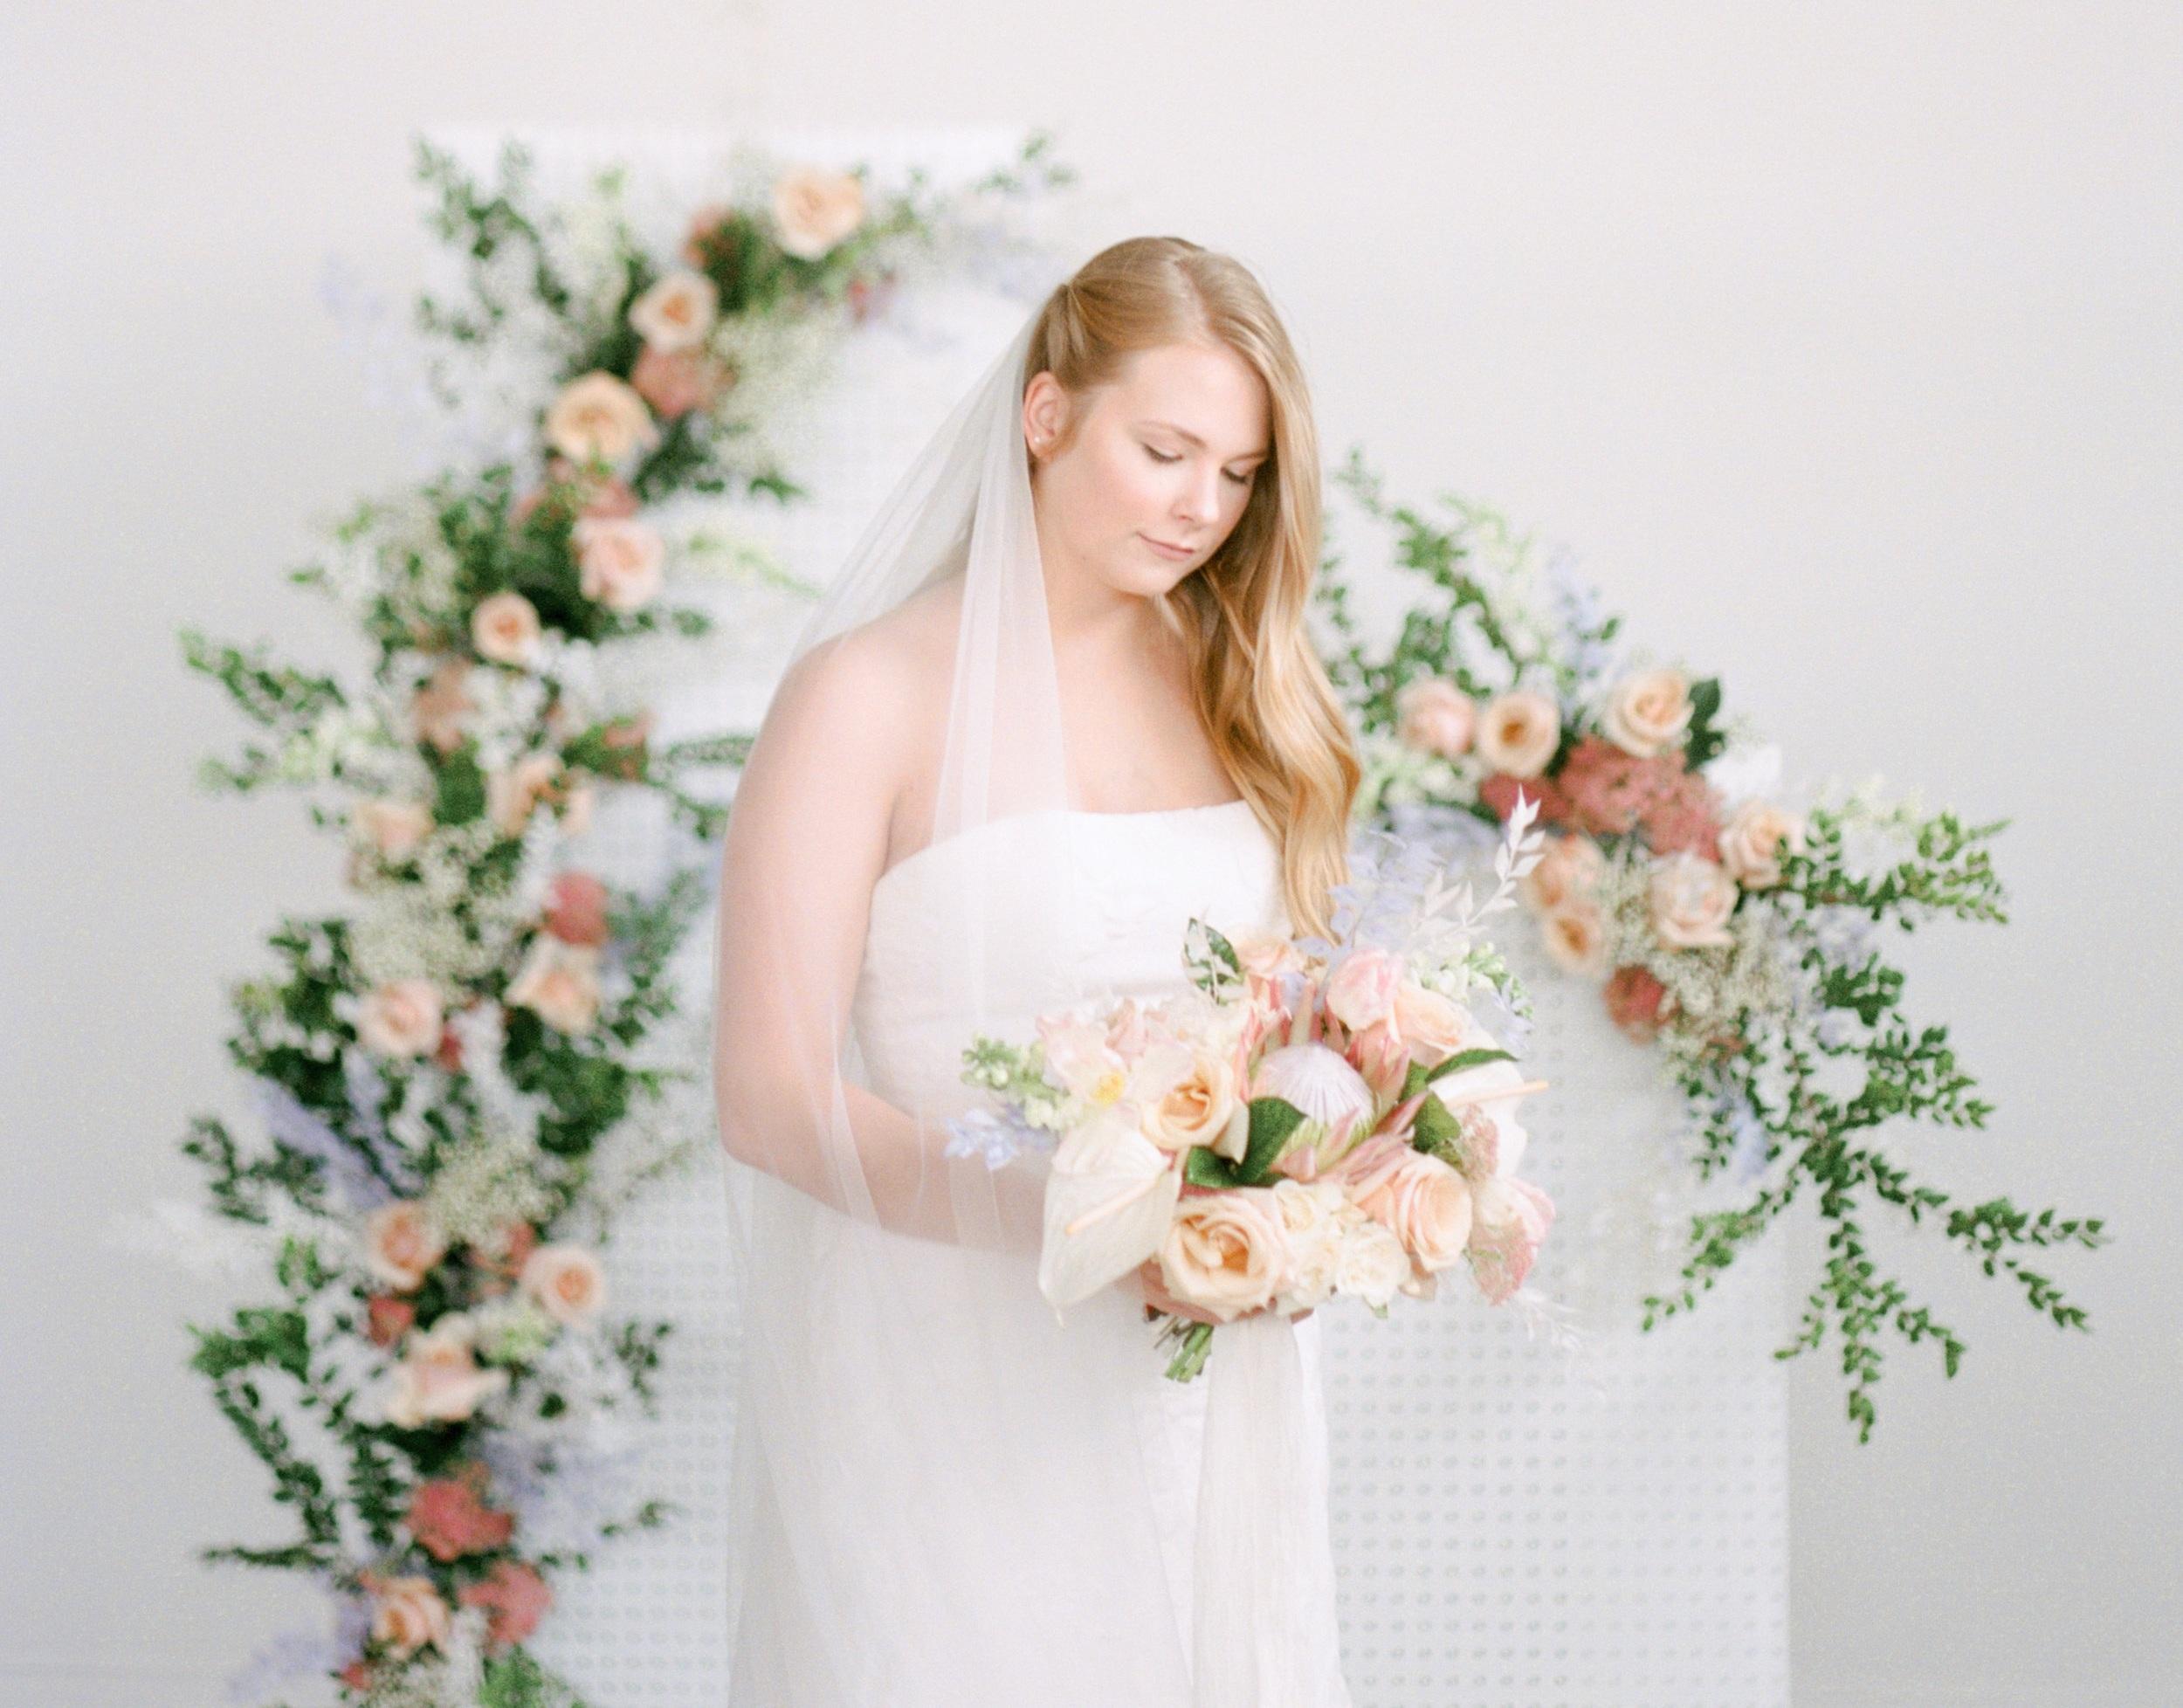 Organic Blush Wedding Flowers | Essen Events